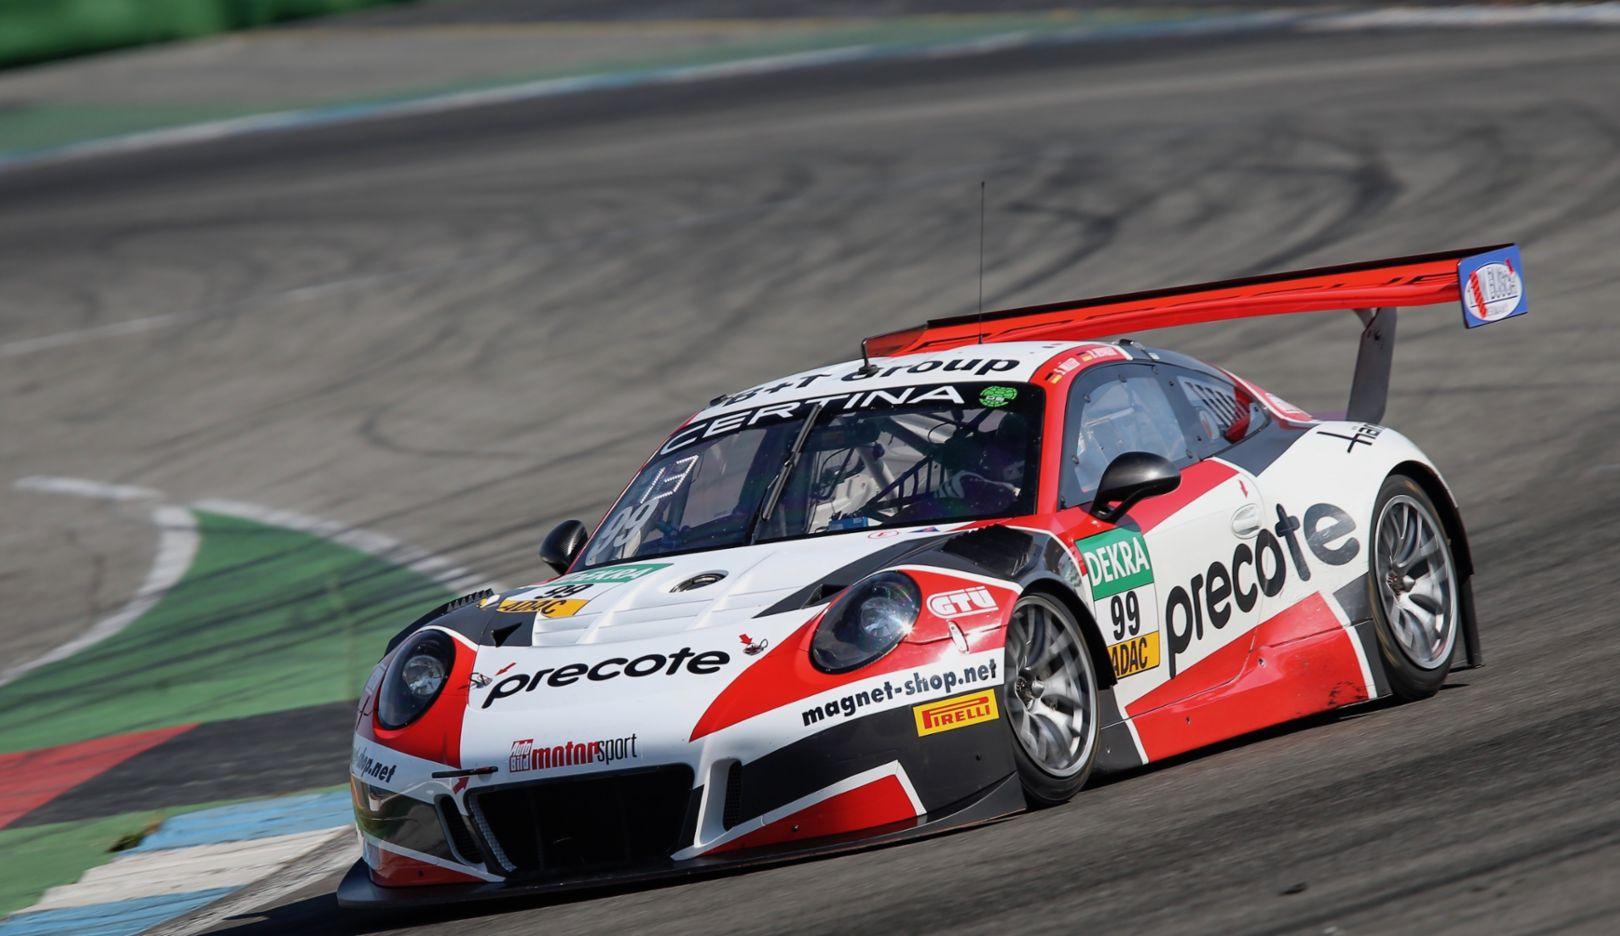 911 GT3 R, Precote Herberth Motorsport, ADAC GT Masters Hockenheimring, 2017, Porsche AG